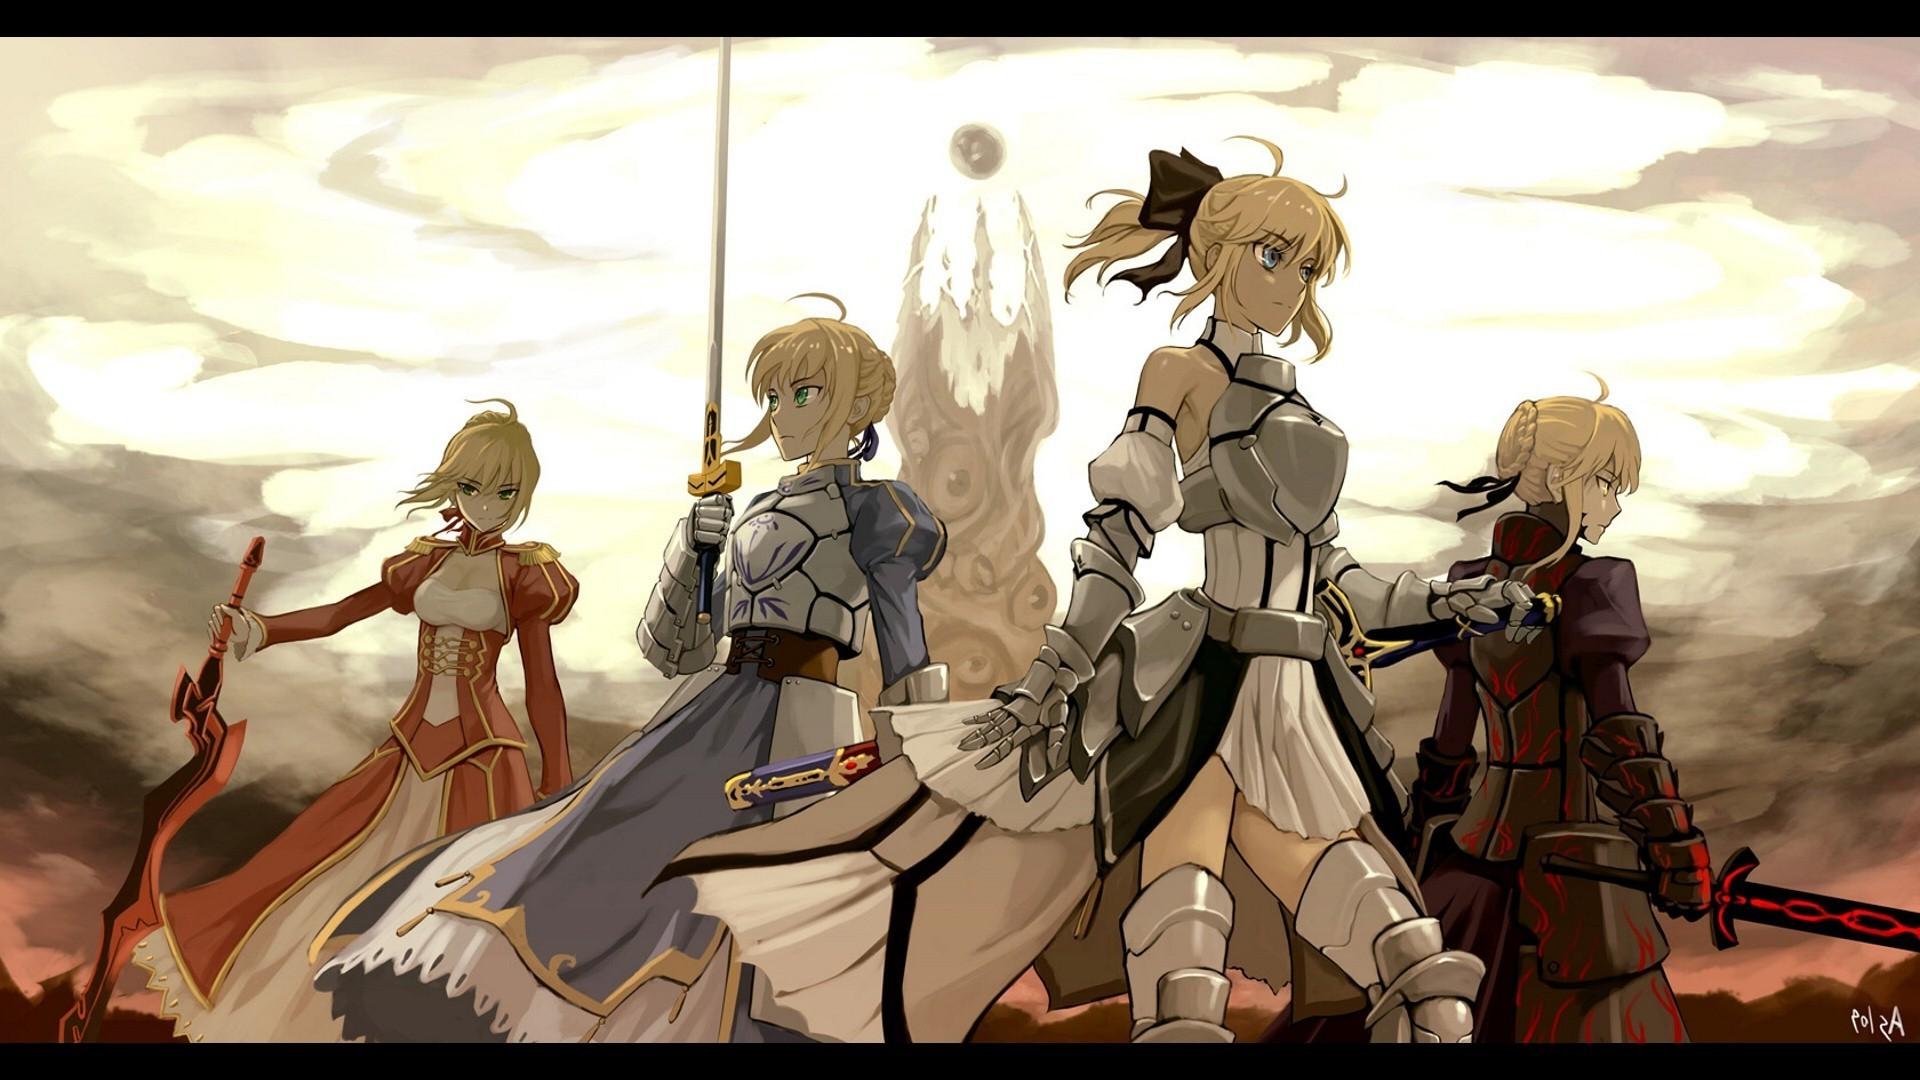 anime, Fate Zero, Fate Series, Fate Stay Night, Saber, Empress Nero